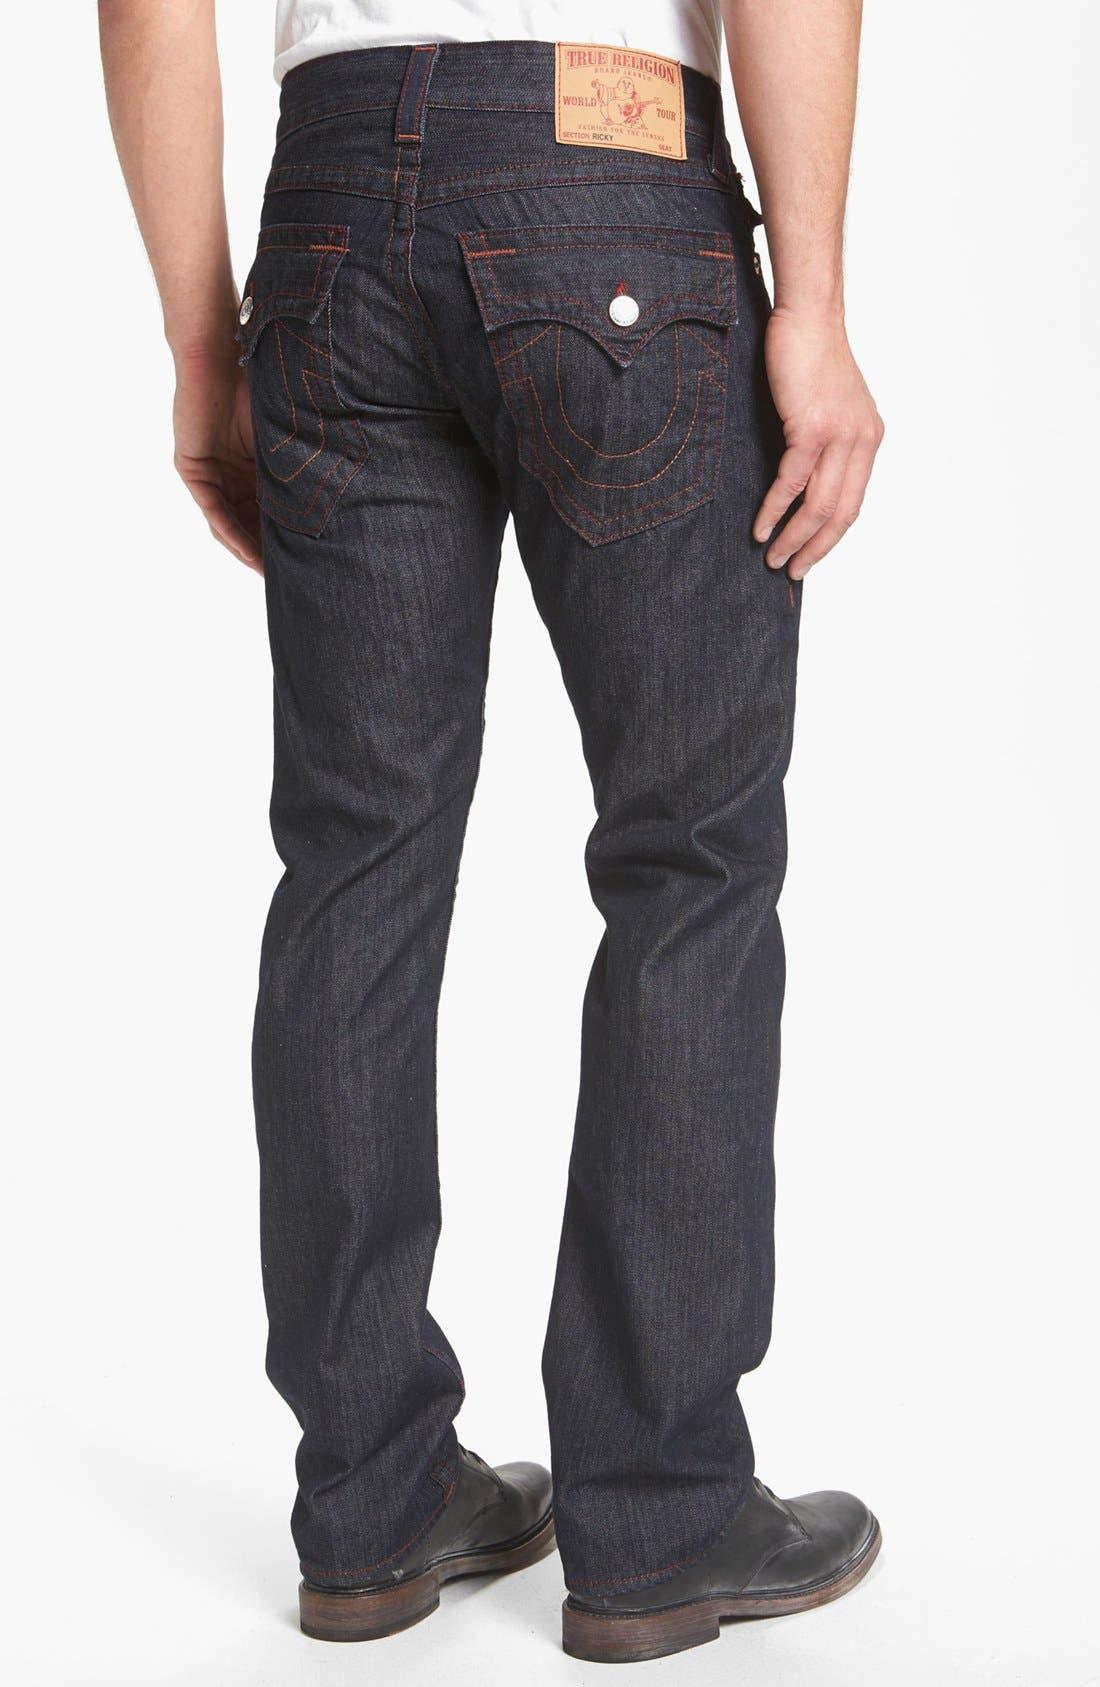 Alternate Image 1 Selected - True Religion Brand Jeans 'Ricky' Straight Leg Jeans (Body Rinse)